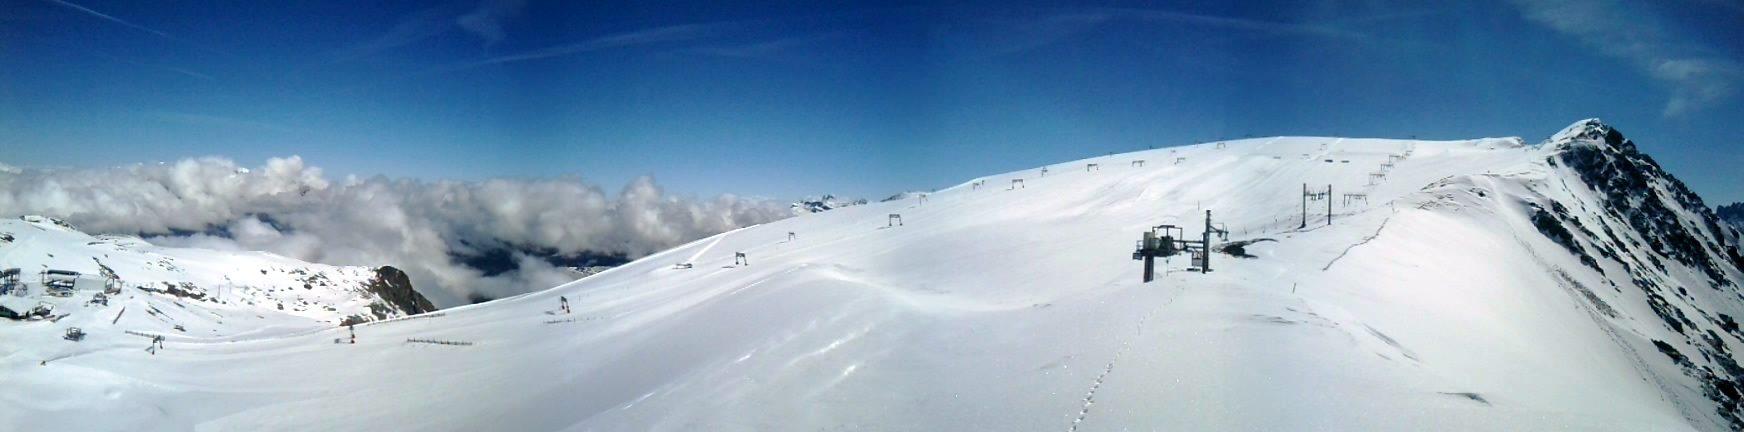 Current conditions on Les 2 Alpes glacier